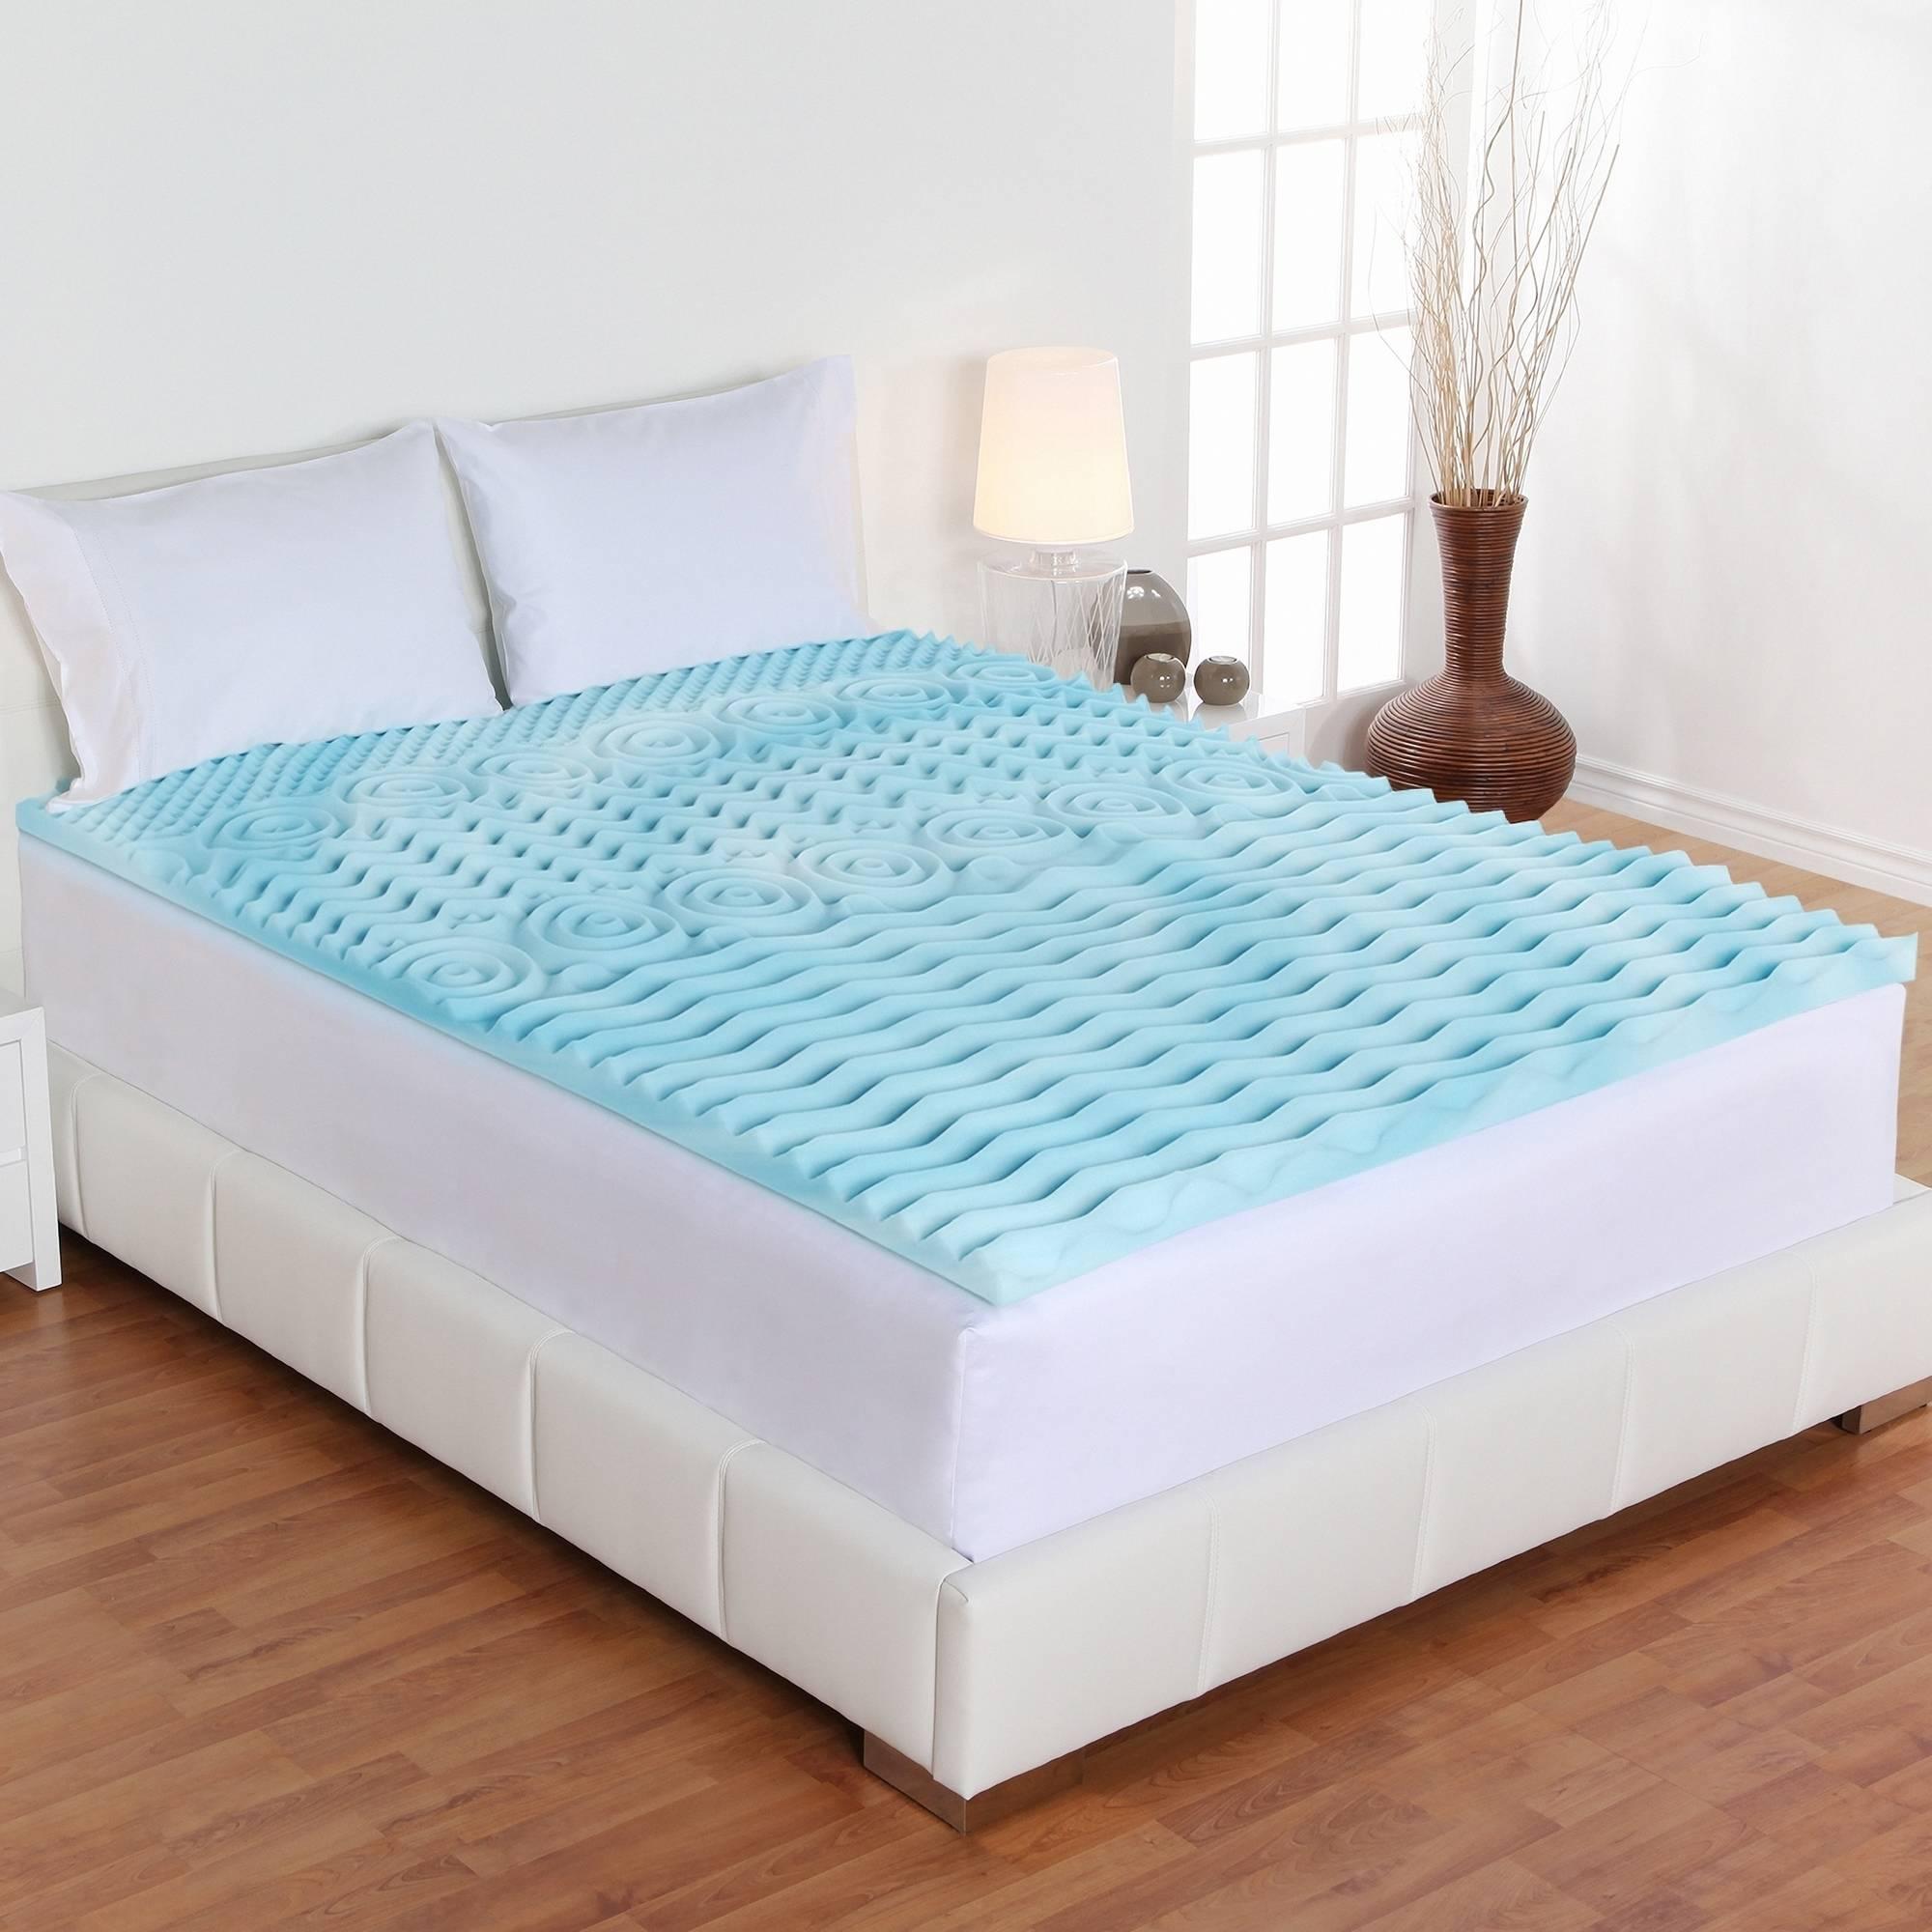 comfort rx orthopedic foam mattress topper multiple sizes cooling